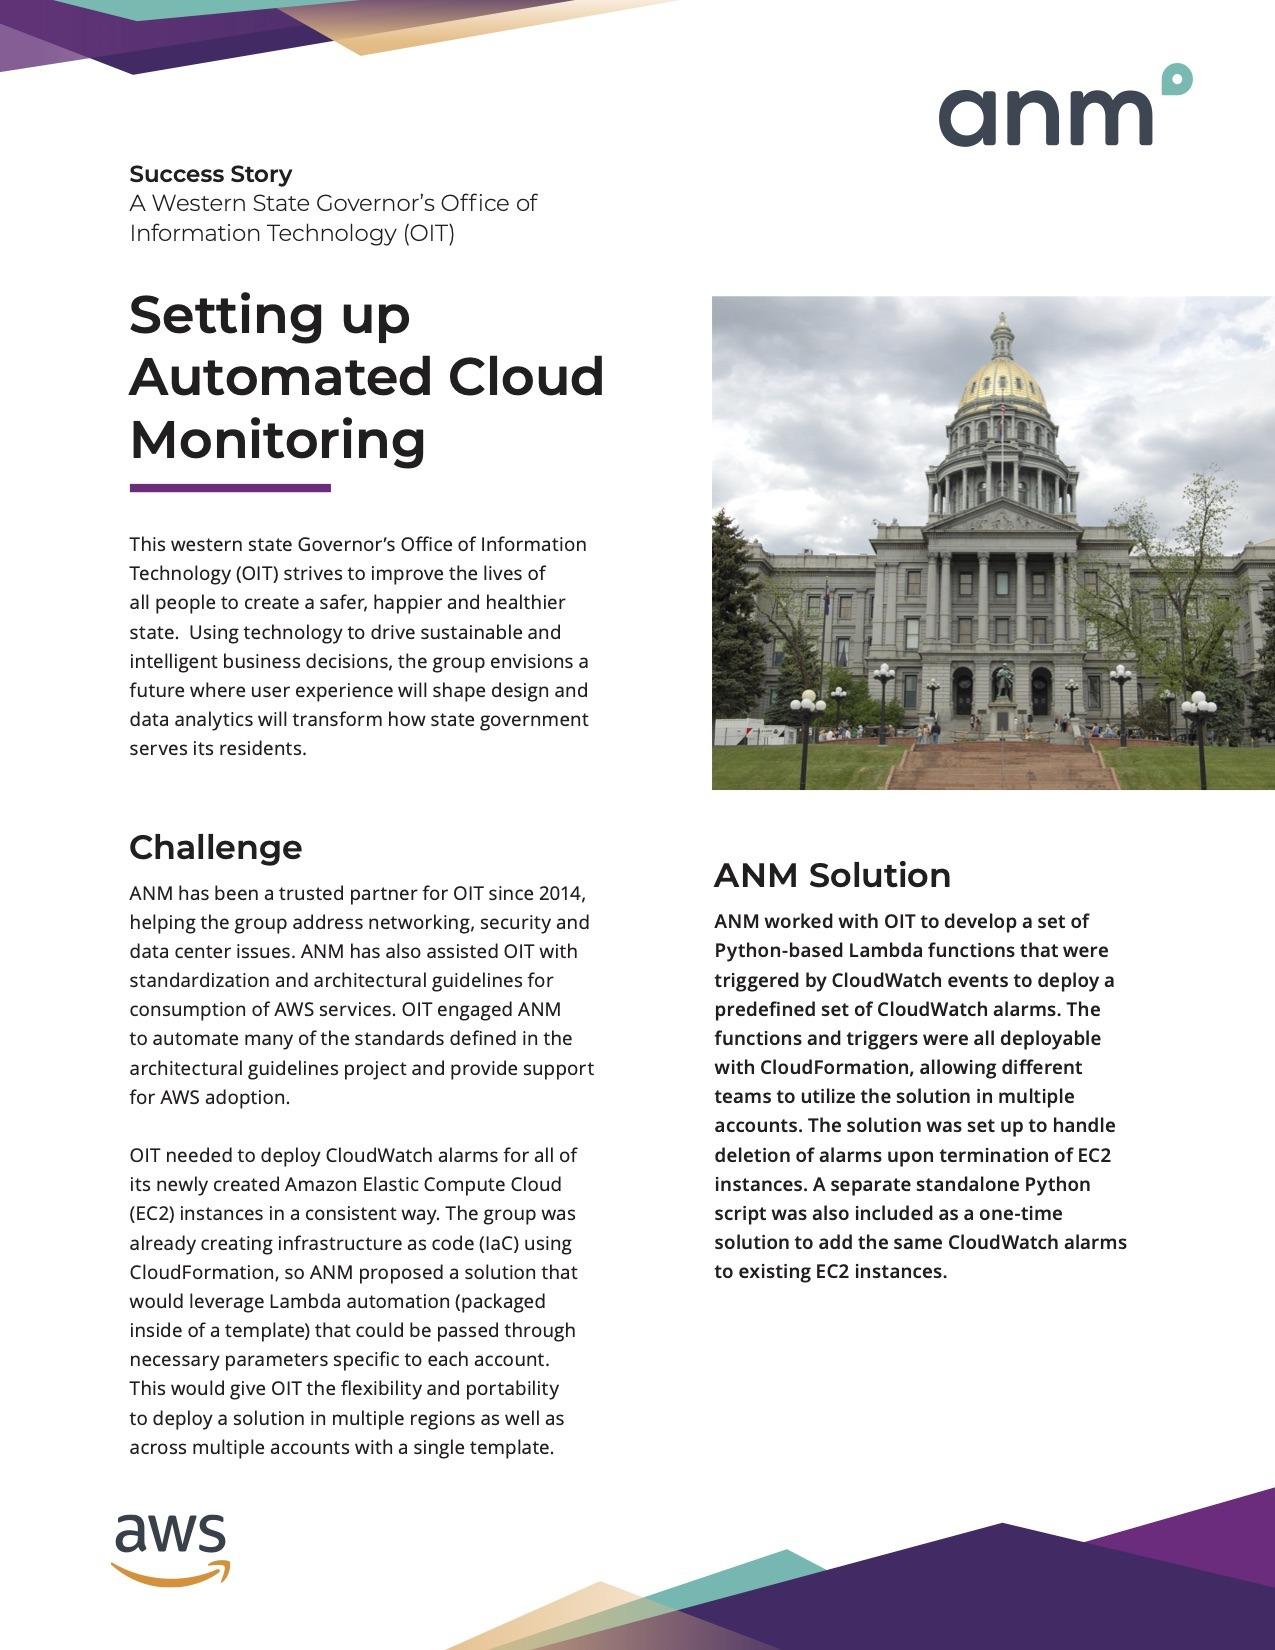 ANM Data Center & Cloud case study